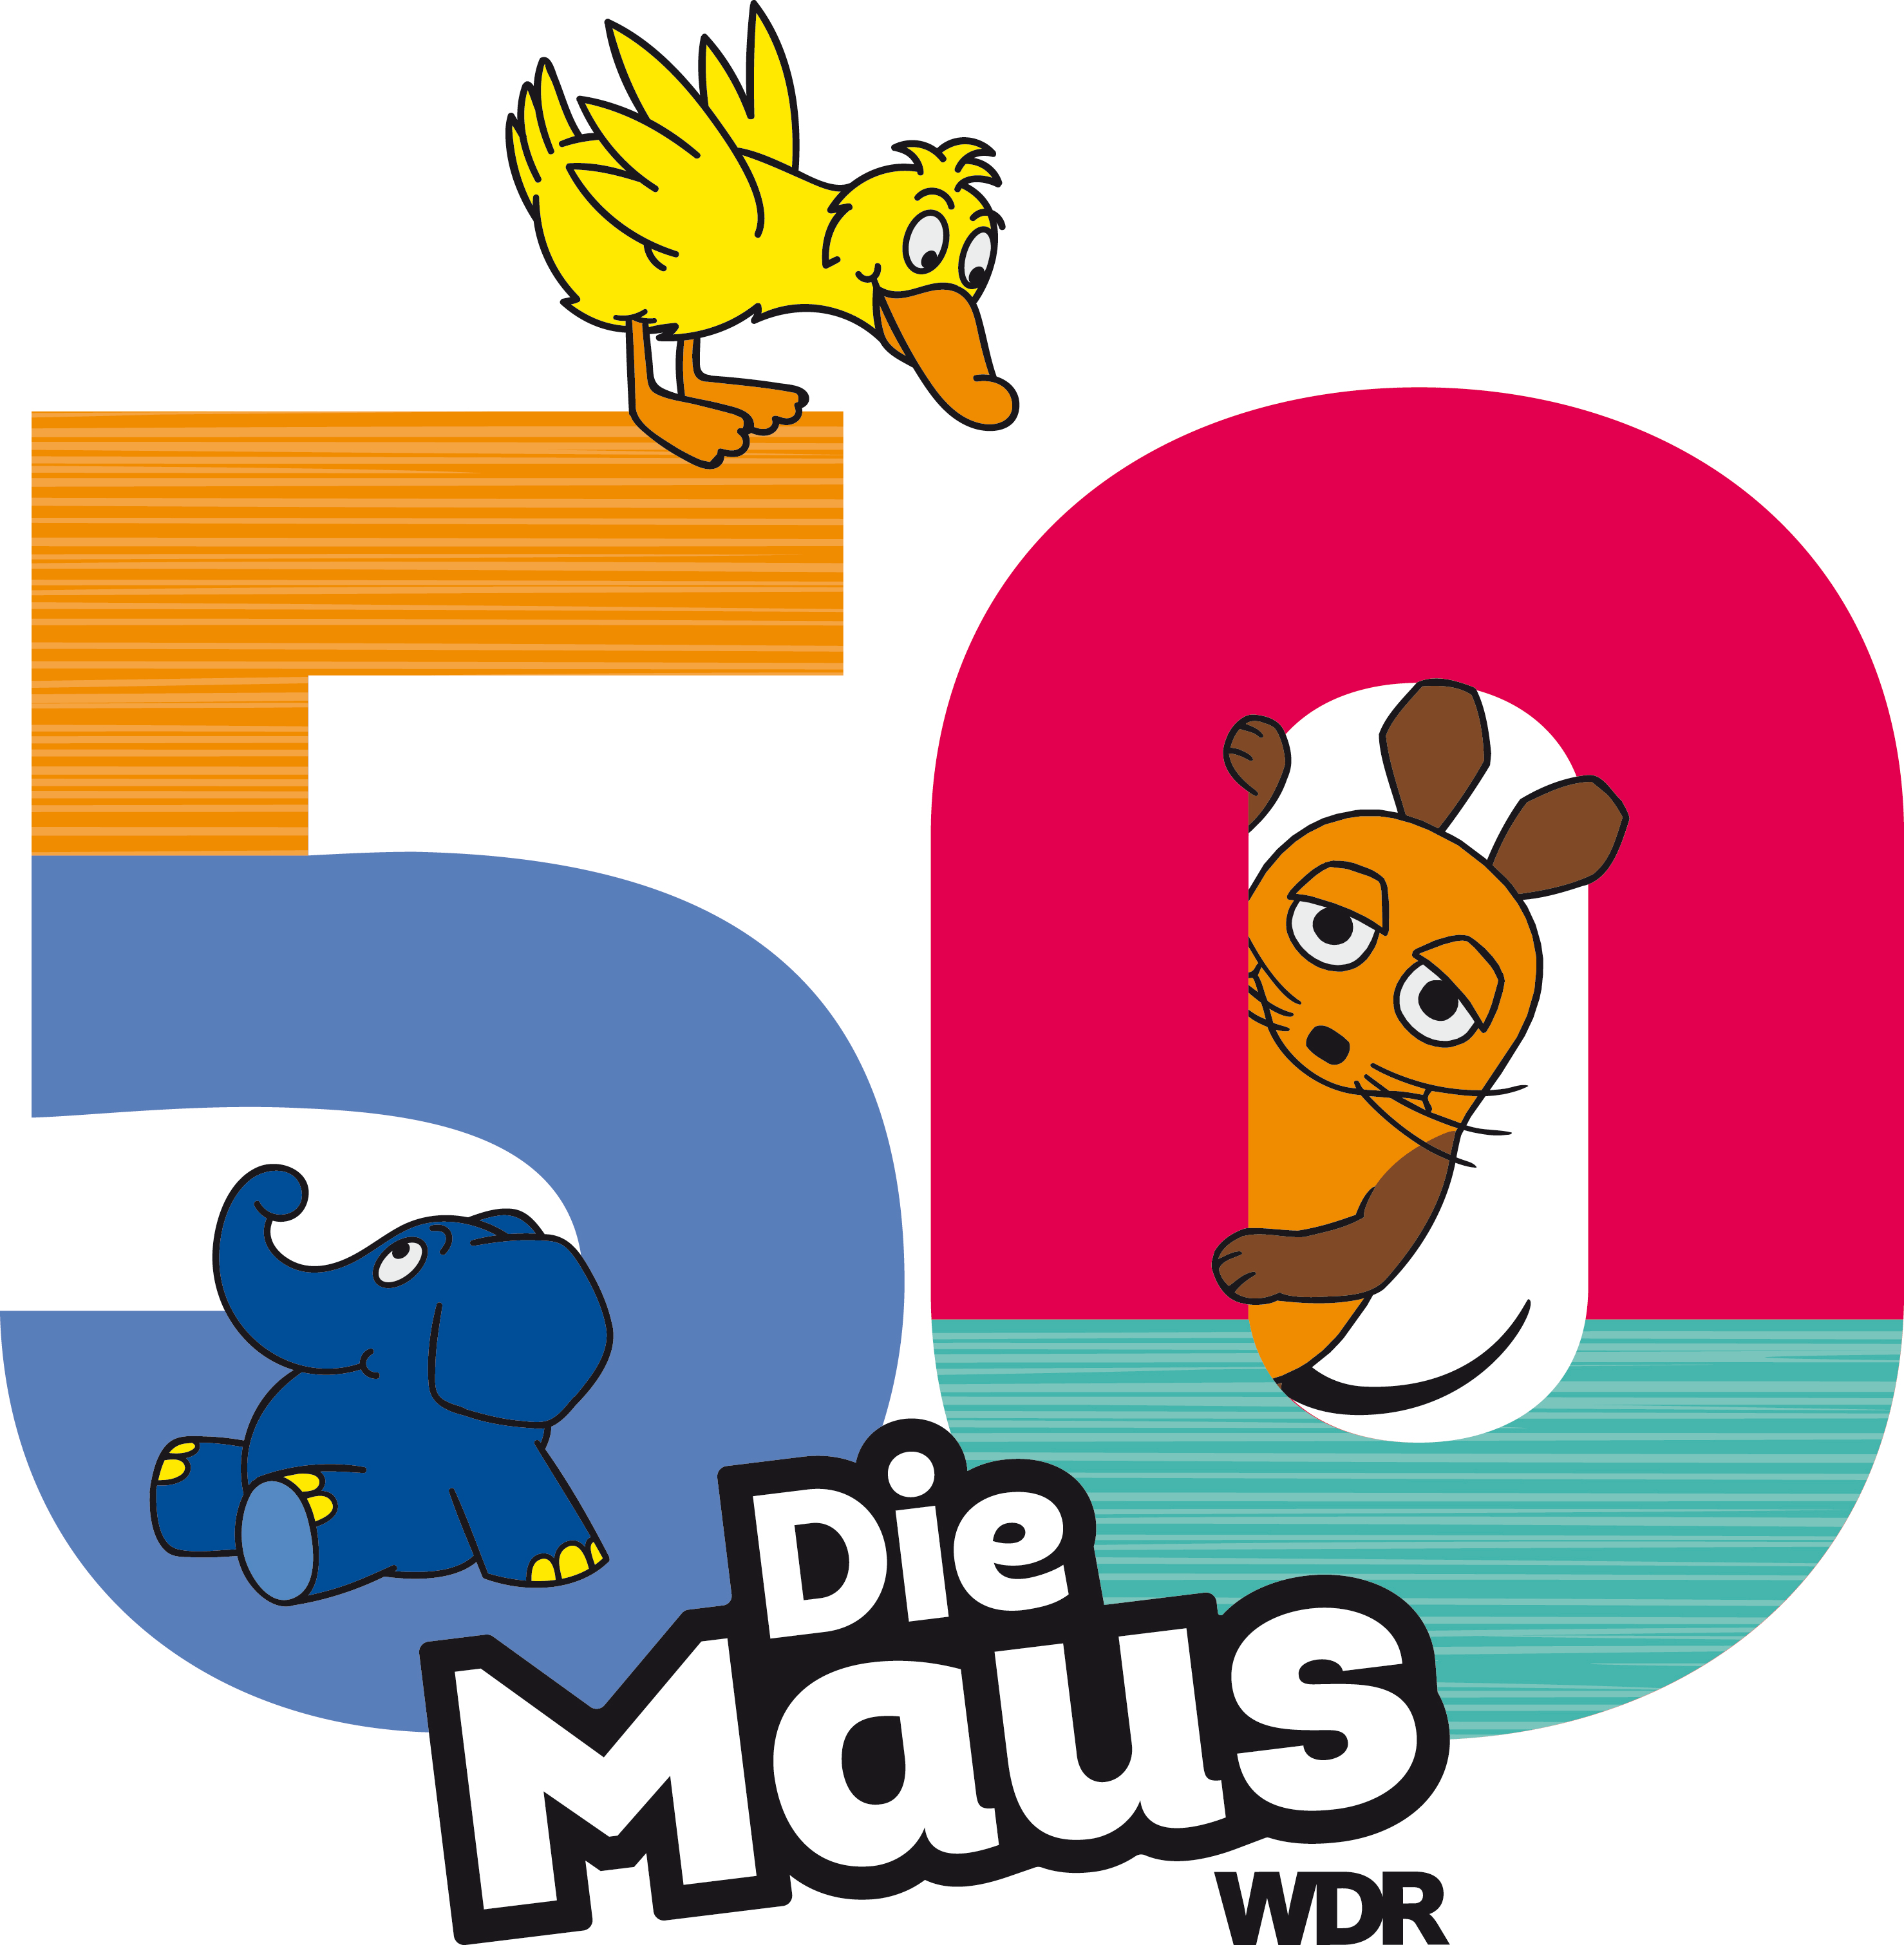 Wdr Diemaus50 Logodhhfgx6S1Zmch